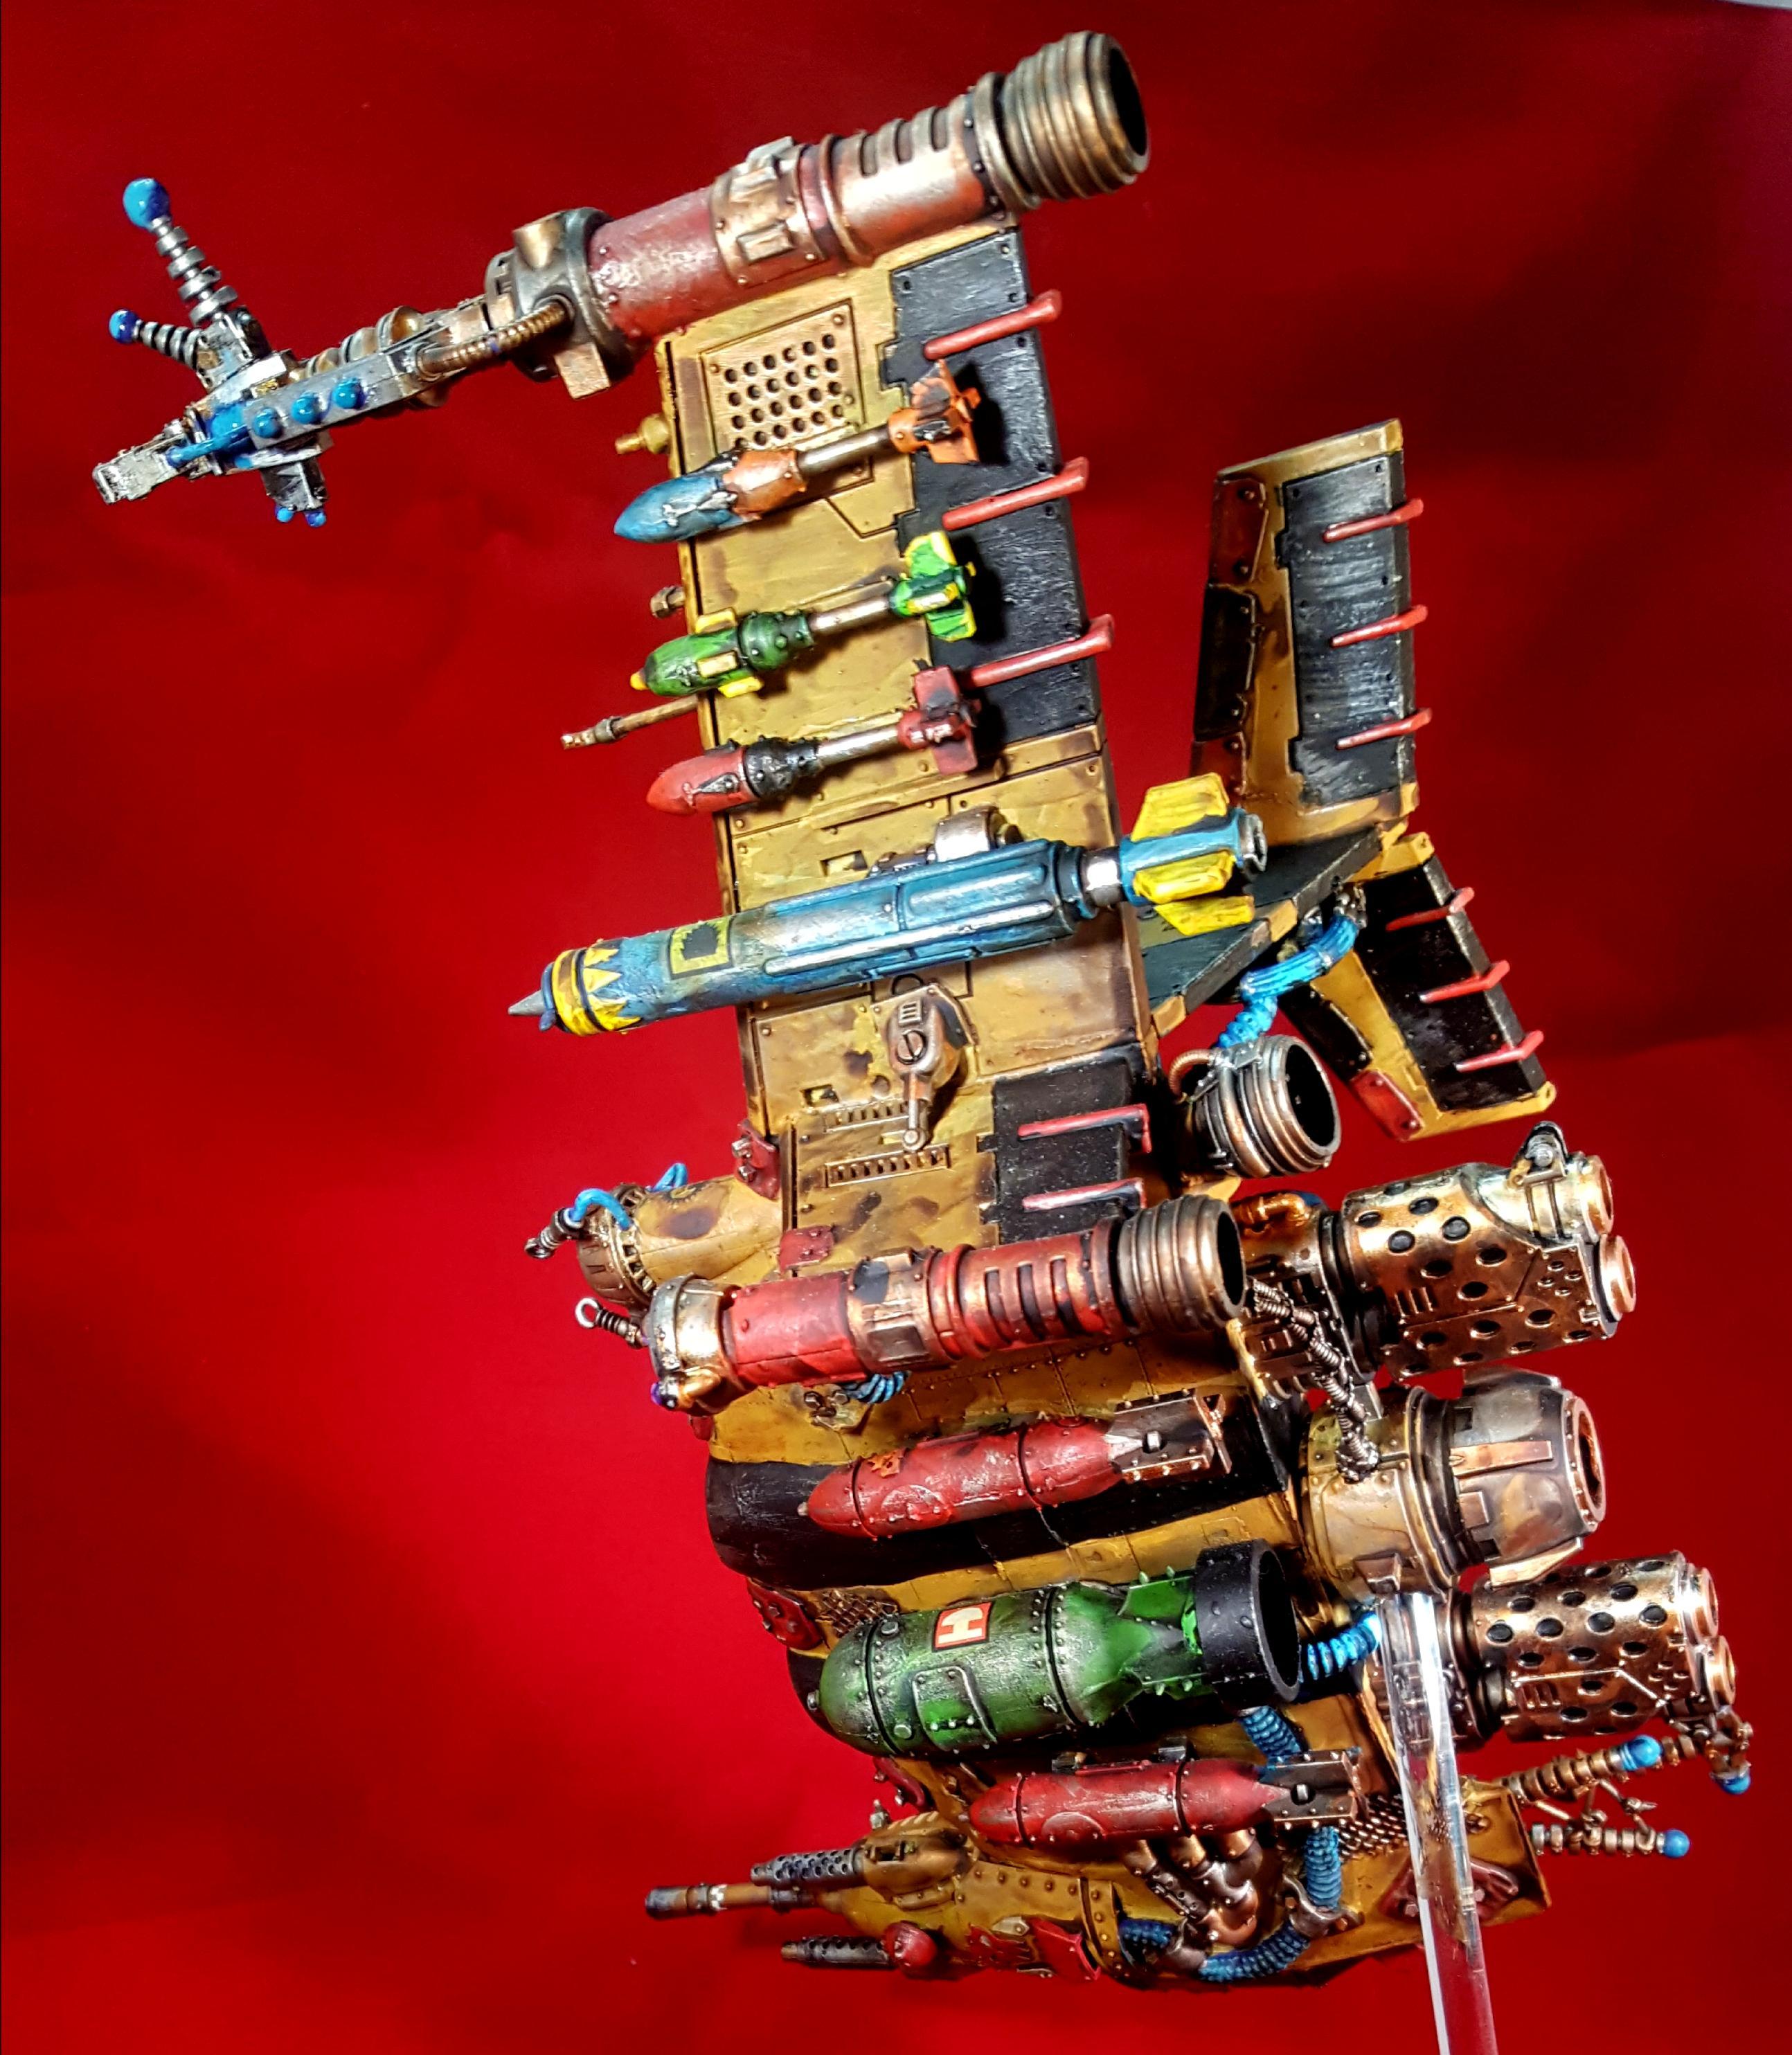 Aircraft, Bad, Dakka Dakka, Dreadnought, Jet, Looted, Mechanicum, Mob, Moons, Orks, Wagon, Walkers